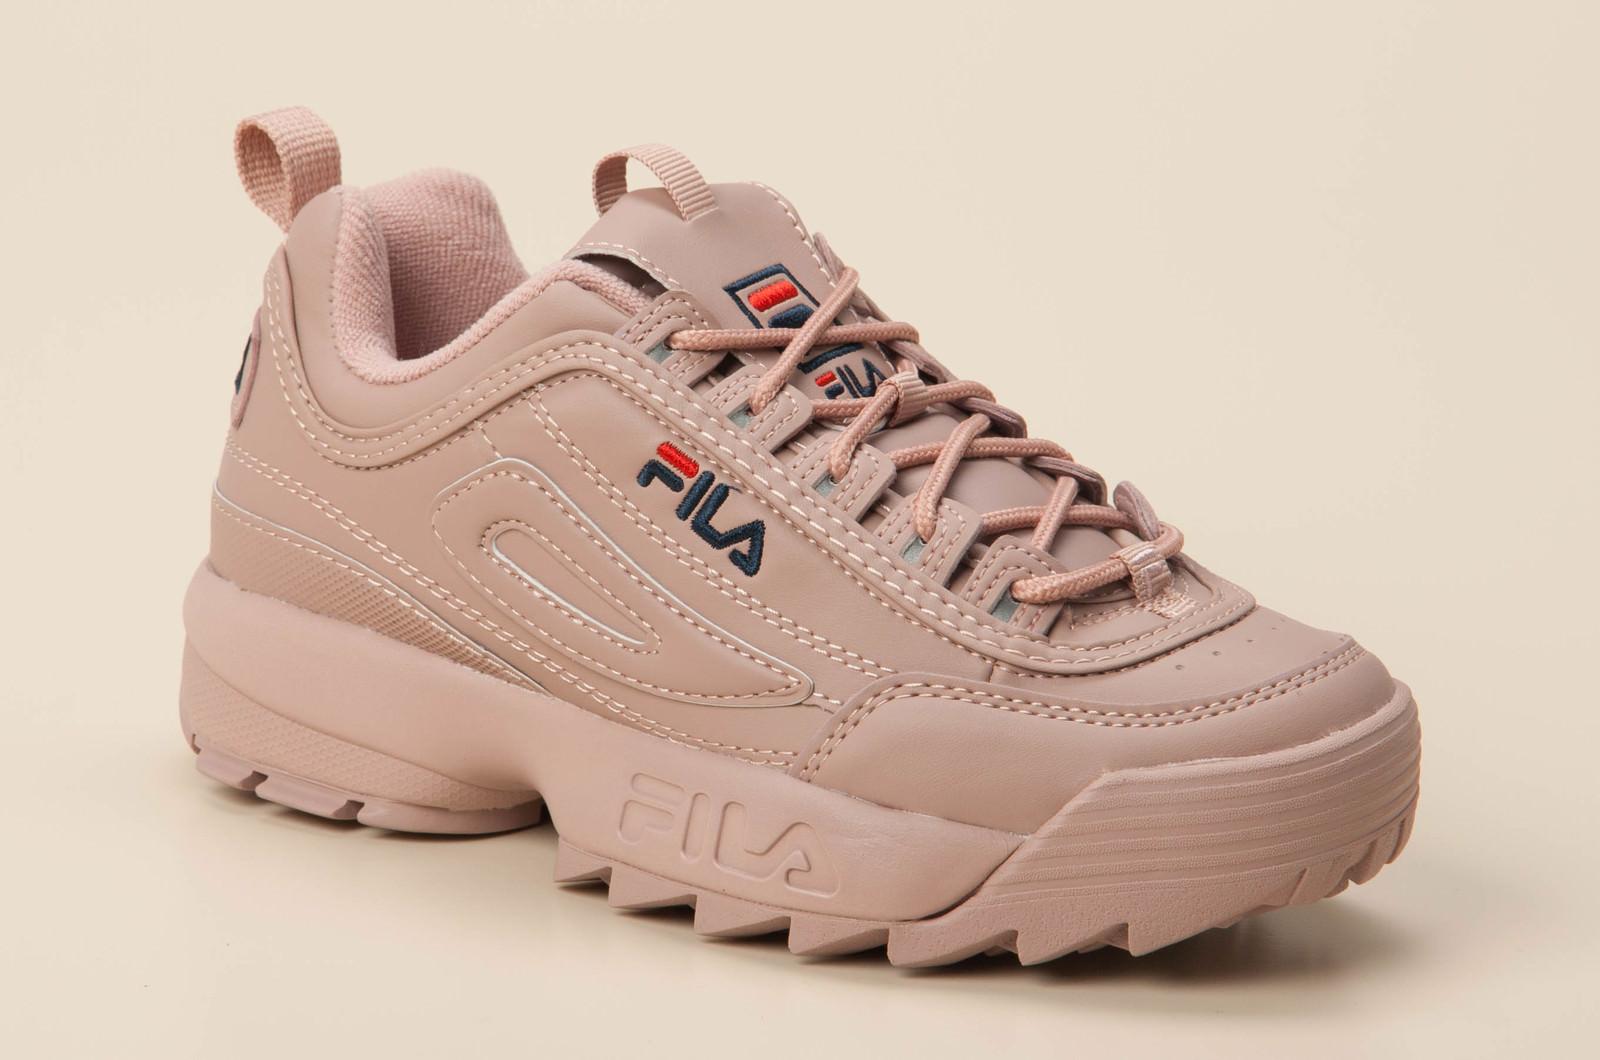 14d9b6bc8727 Fila Damen Sneaker in Pink kaufen   Zumnorde Online-Shop